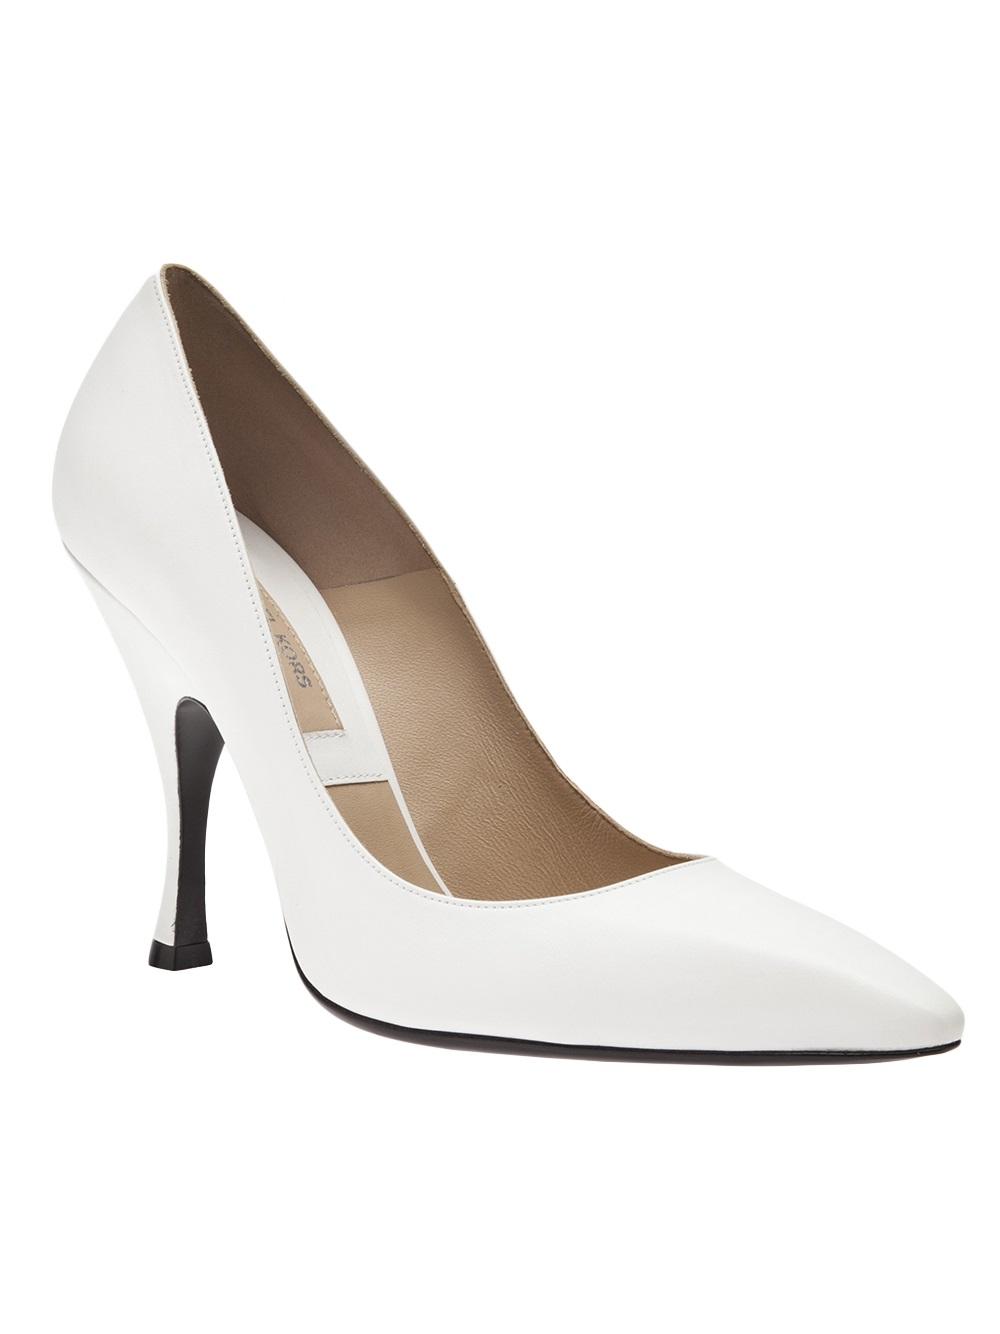 lyst michael kors curved heel pump in white. Black Bedroom Furniture Sets. Home Design Ideas